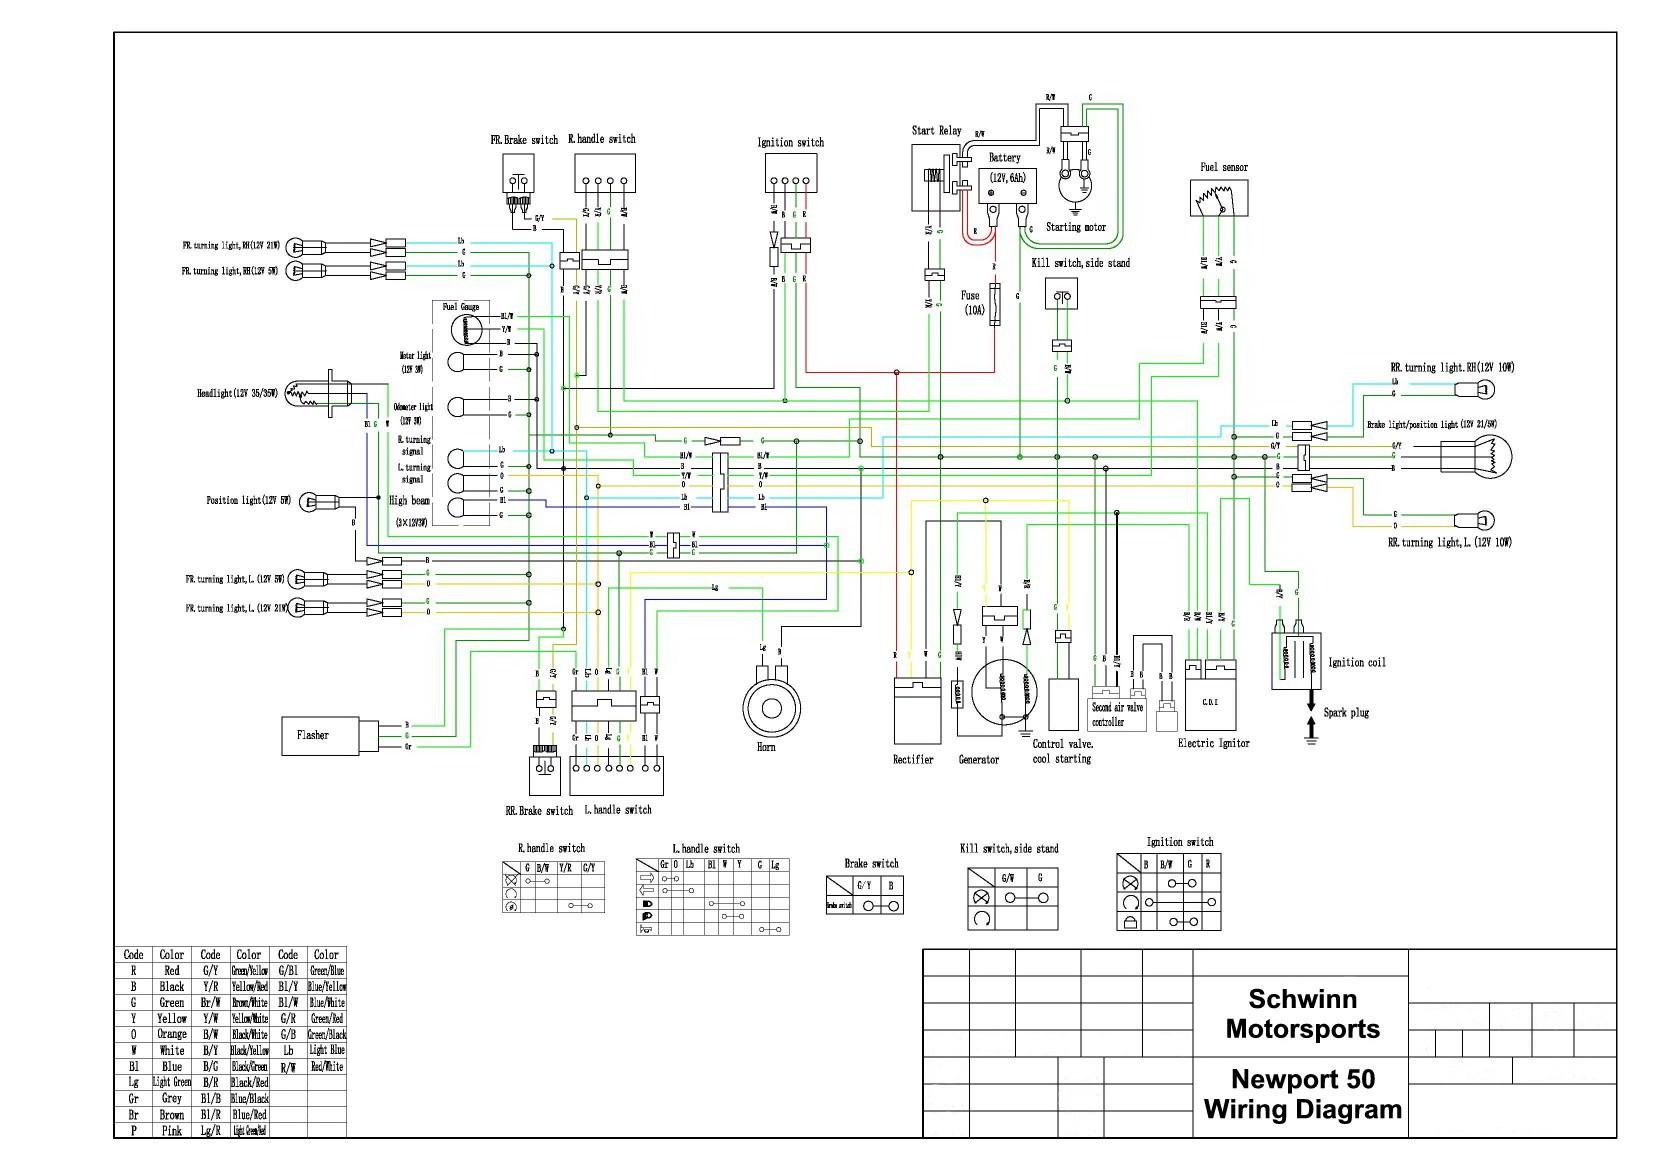 Abb Diagram Motor 3 Wiring Motor7n13c24a906902 Gain 5balmoond